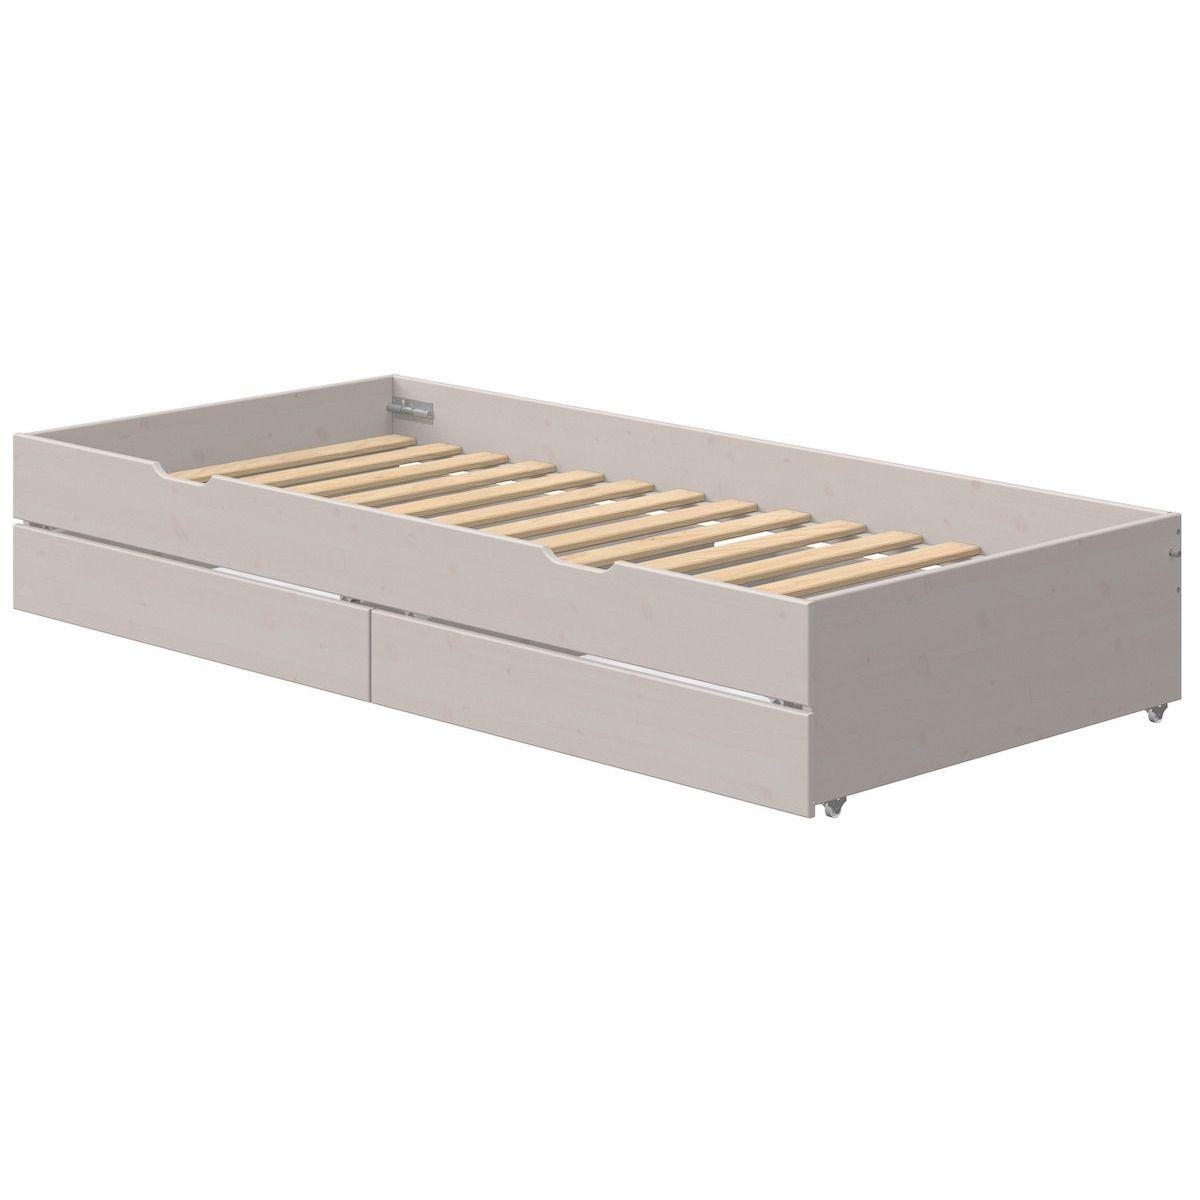 Lit gigogne 90x200cm 2 tiroirs lit bas CLASSIC Flexa grey washed